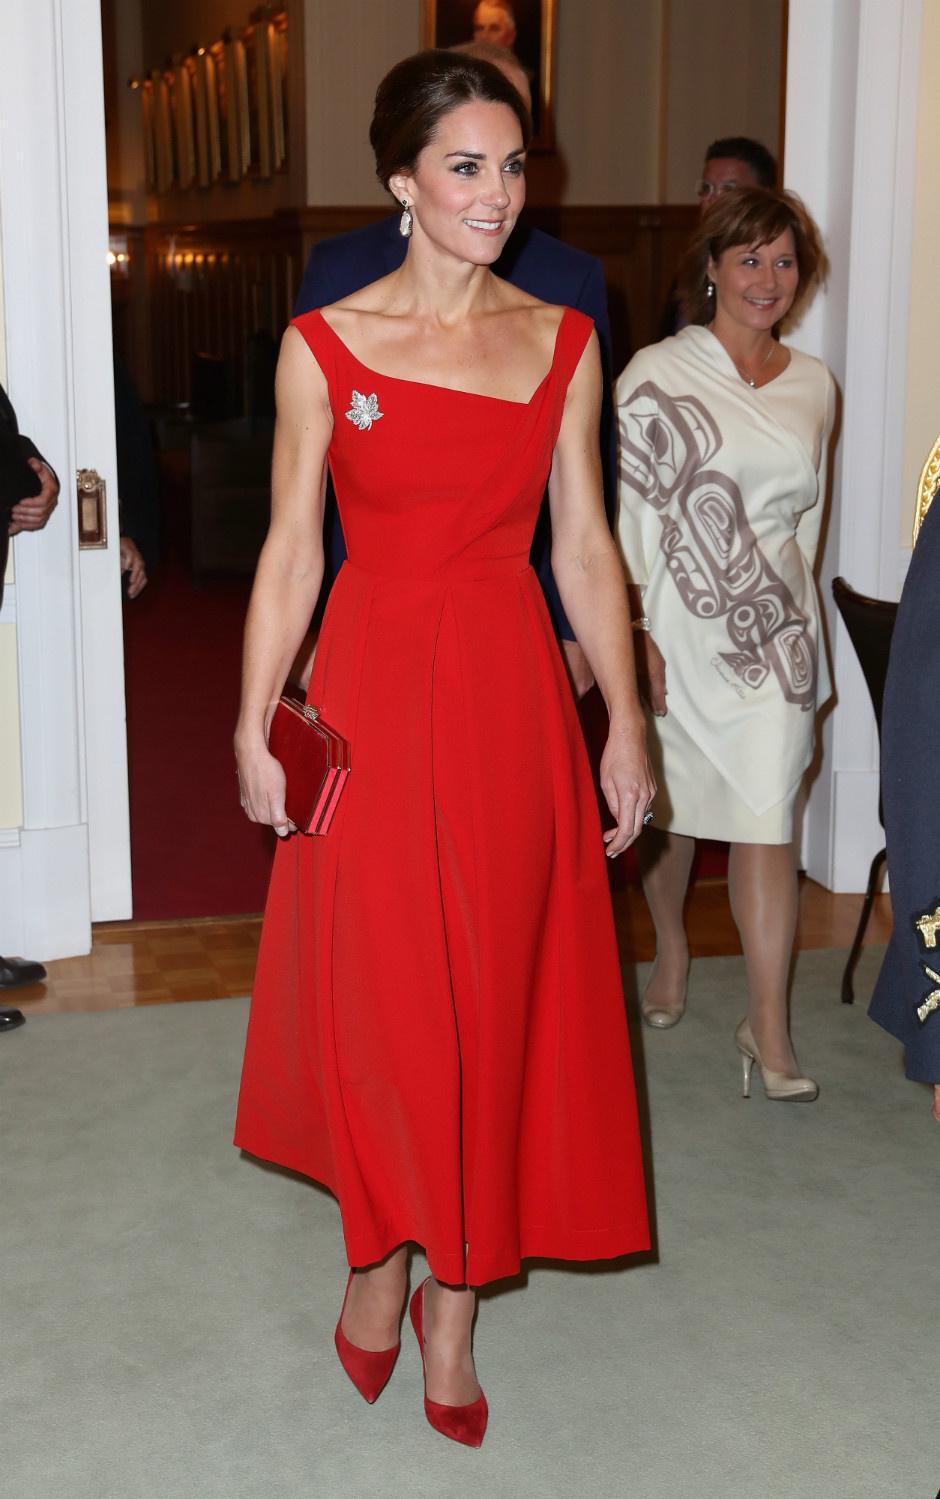 10 раз, когда Кейт Миддлтон пренебрегла королевским дресс-кодом фото [1]